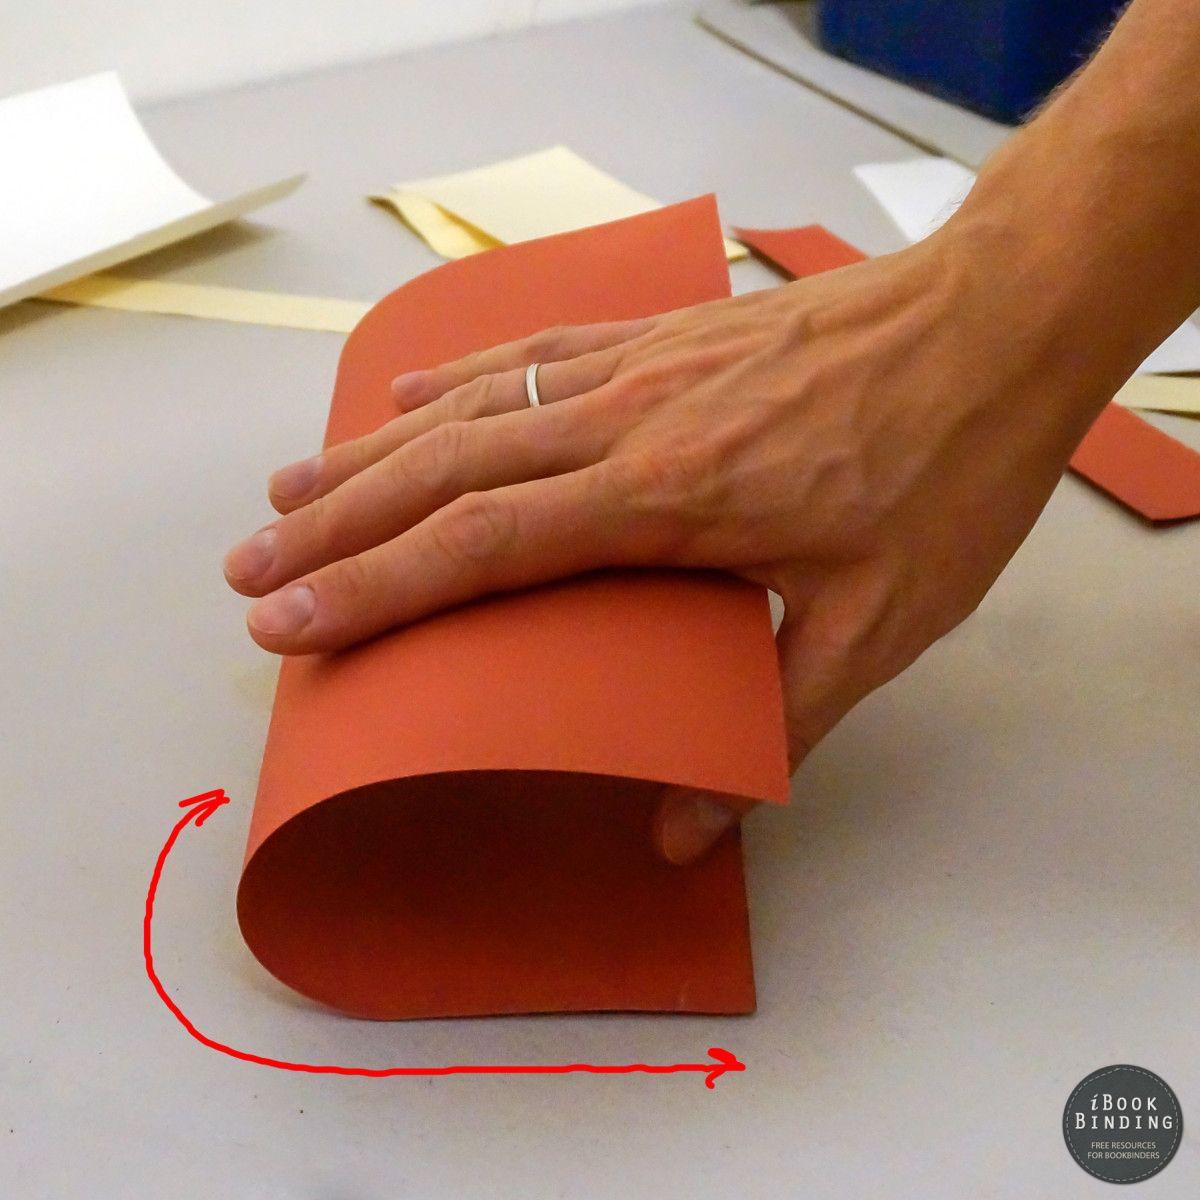 Paper Grain Direction And Cardboard Grain Direction I Bookbinding Free Book Binding Tutorials Resources Bookbinding Tutorial Bookbinding Book Binding